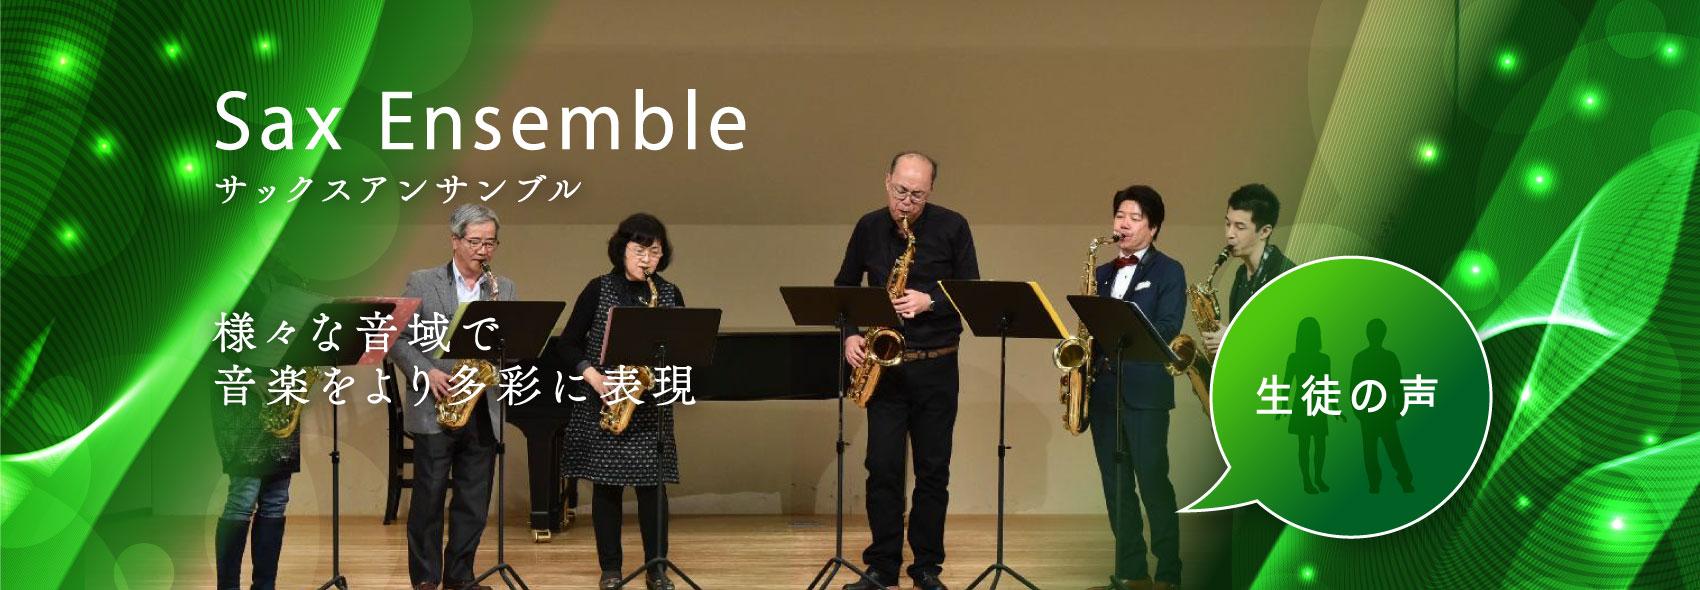 Sax Ensemble 様々な音色で 音楽をより多彩に表現